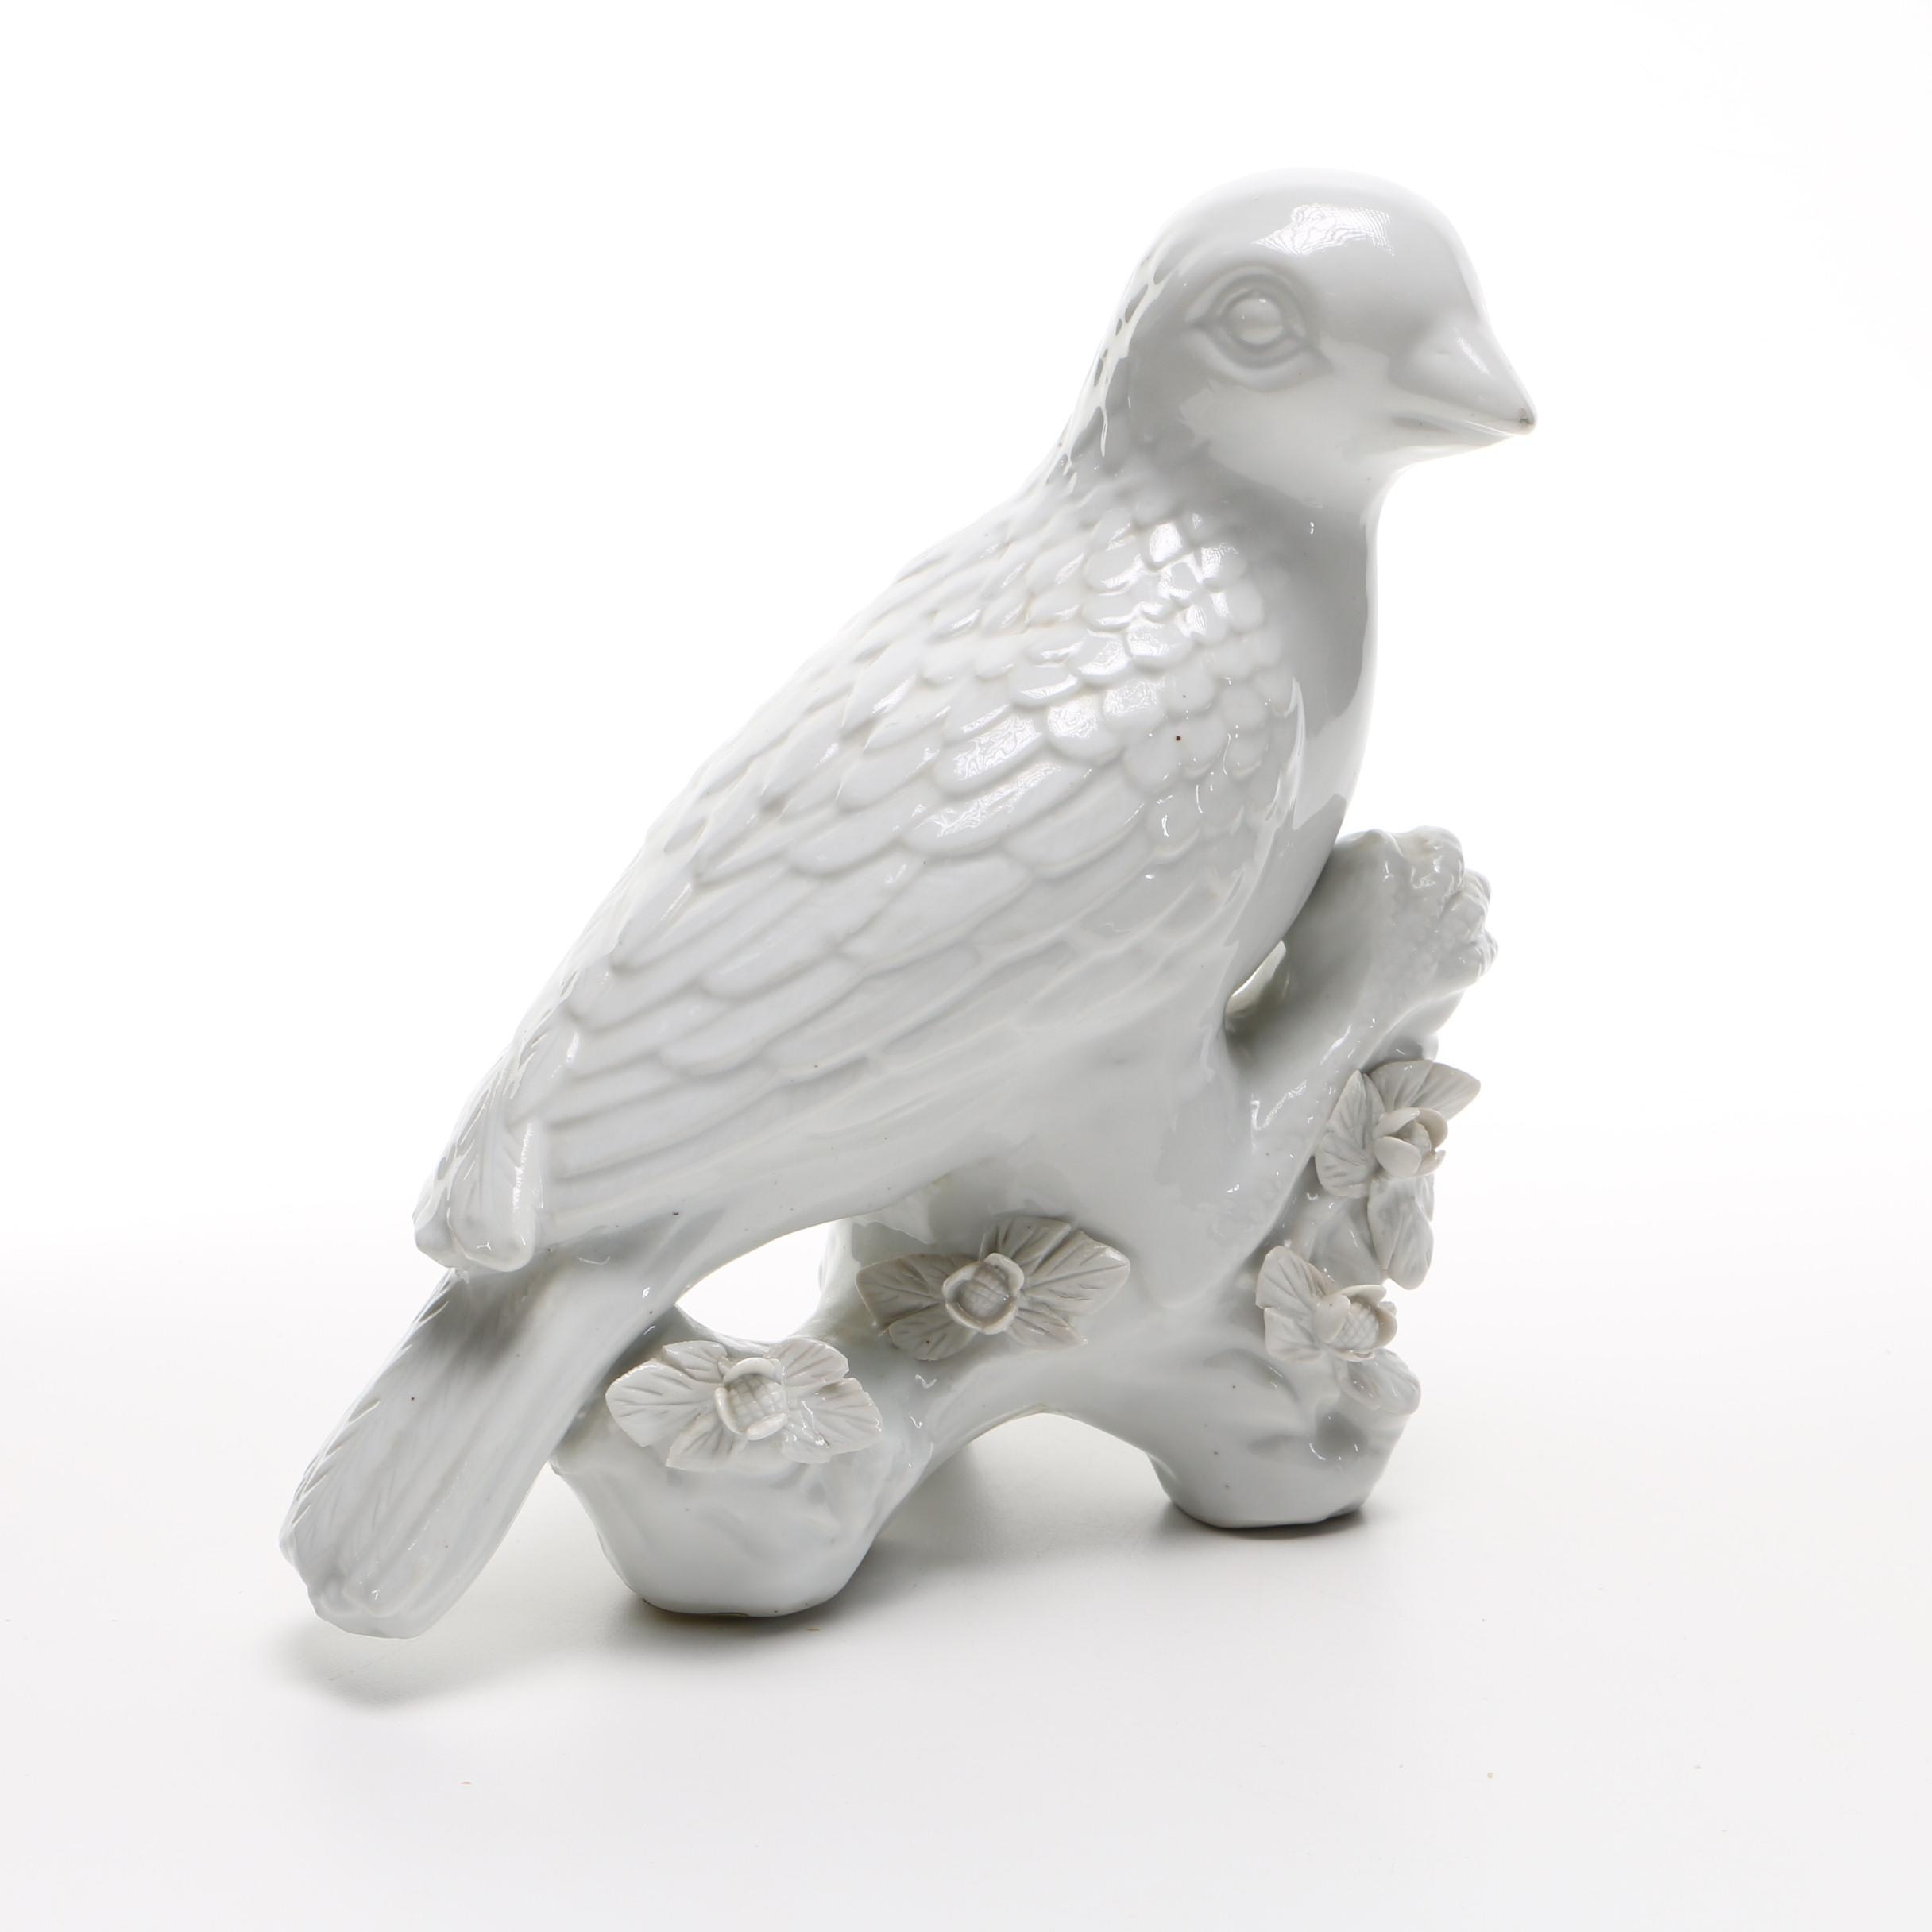 Handmade White Ceramic Bird by Maitland-Smith Ltd.